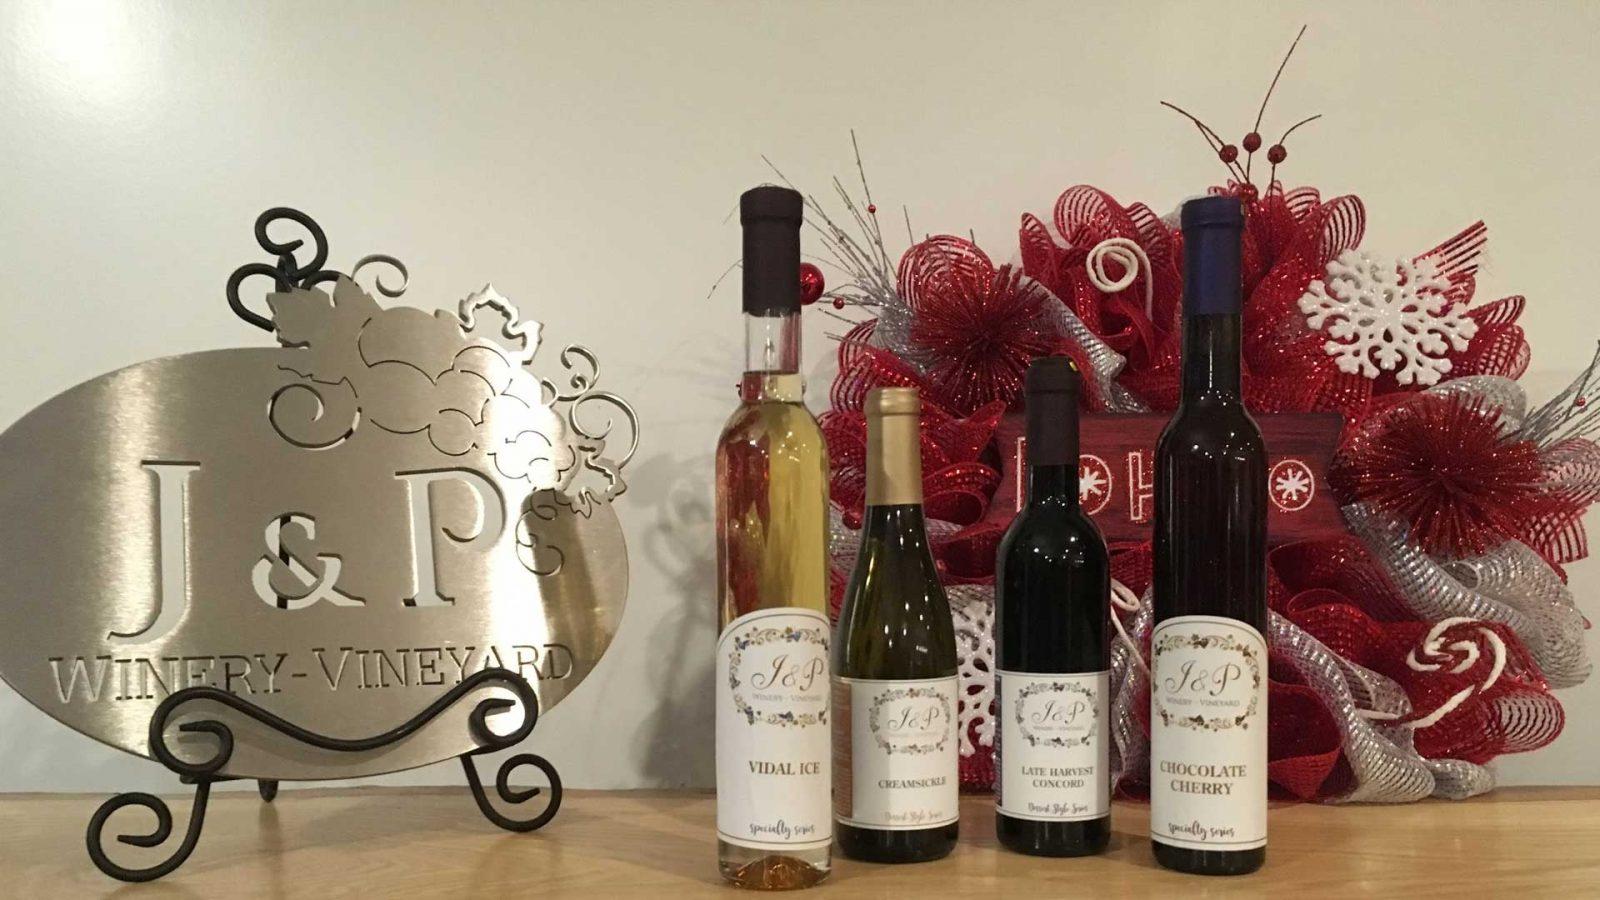 J & P Winery